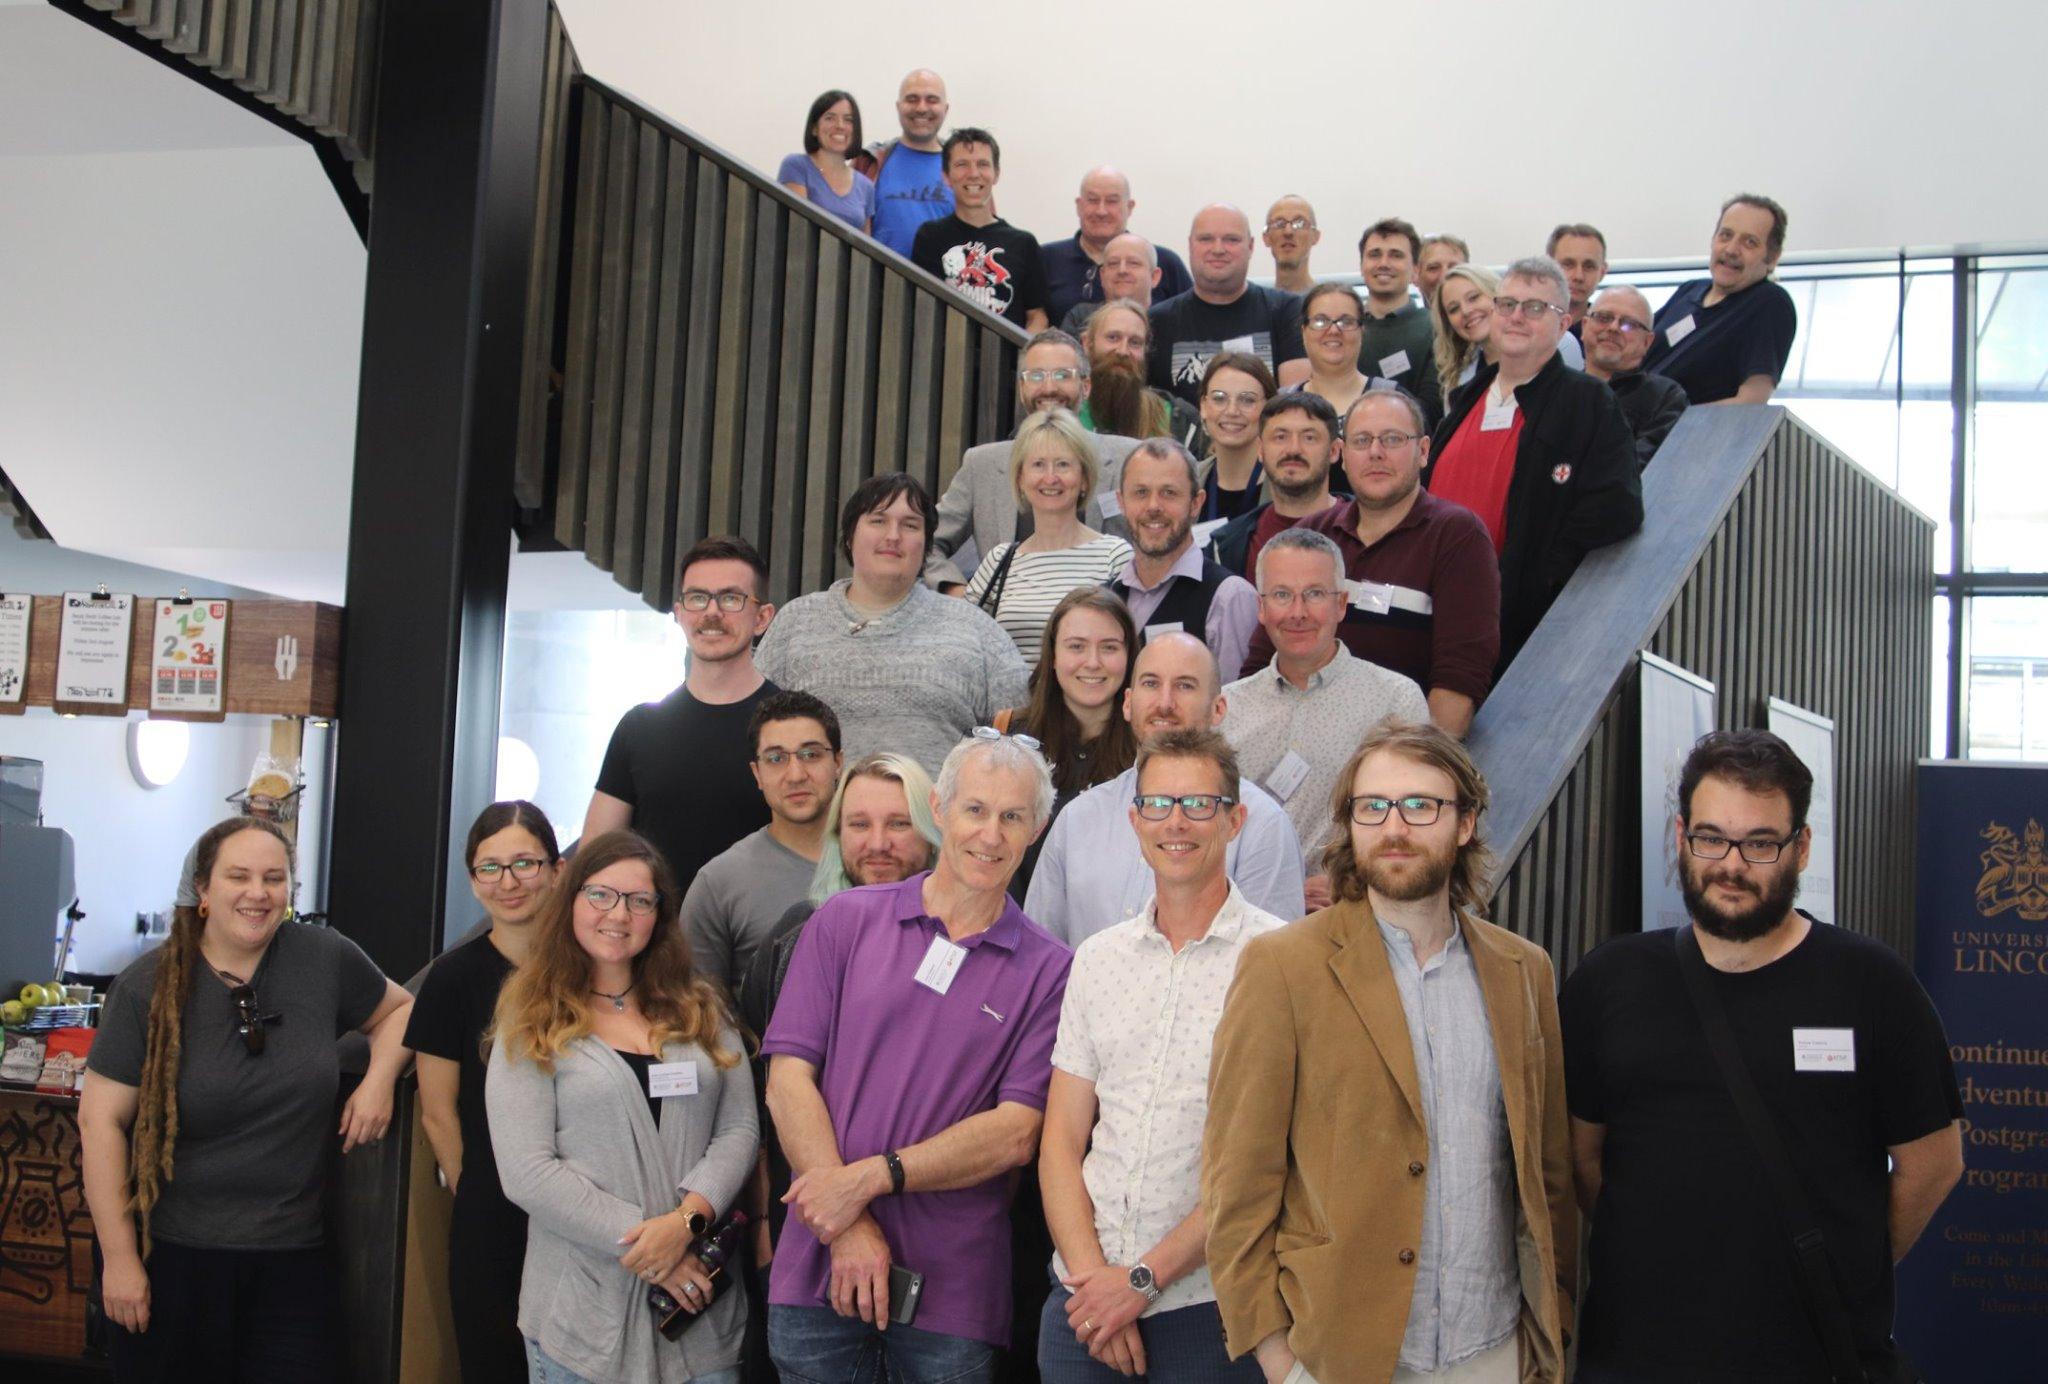 Conference Roundup - ATSiP 2019